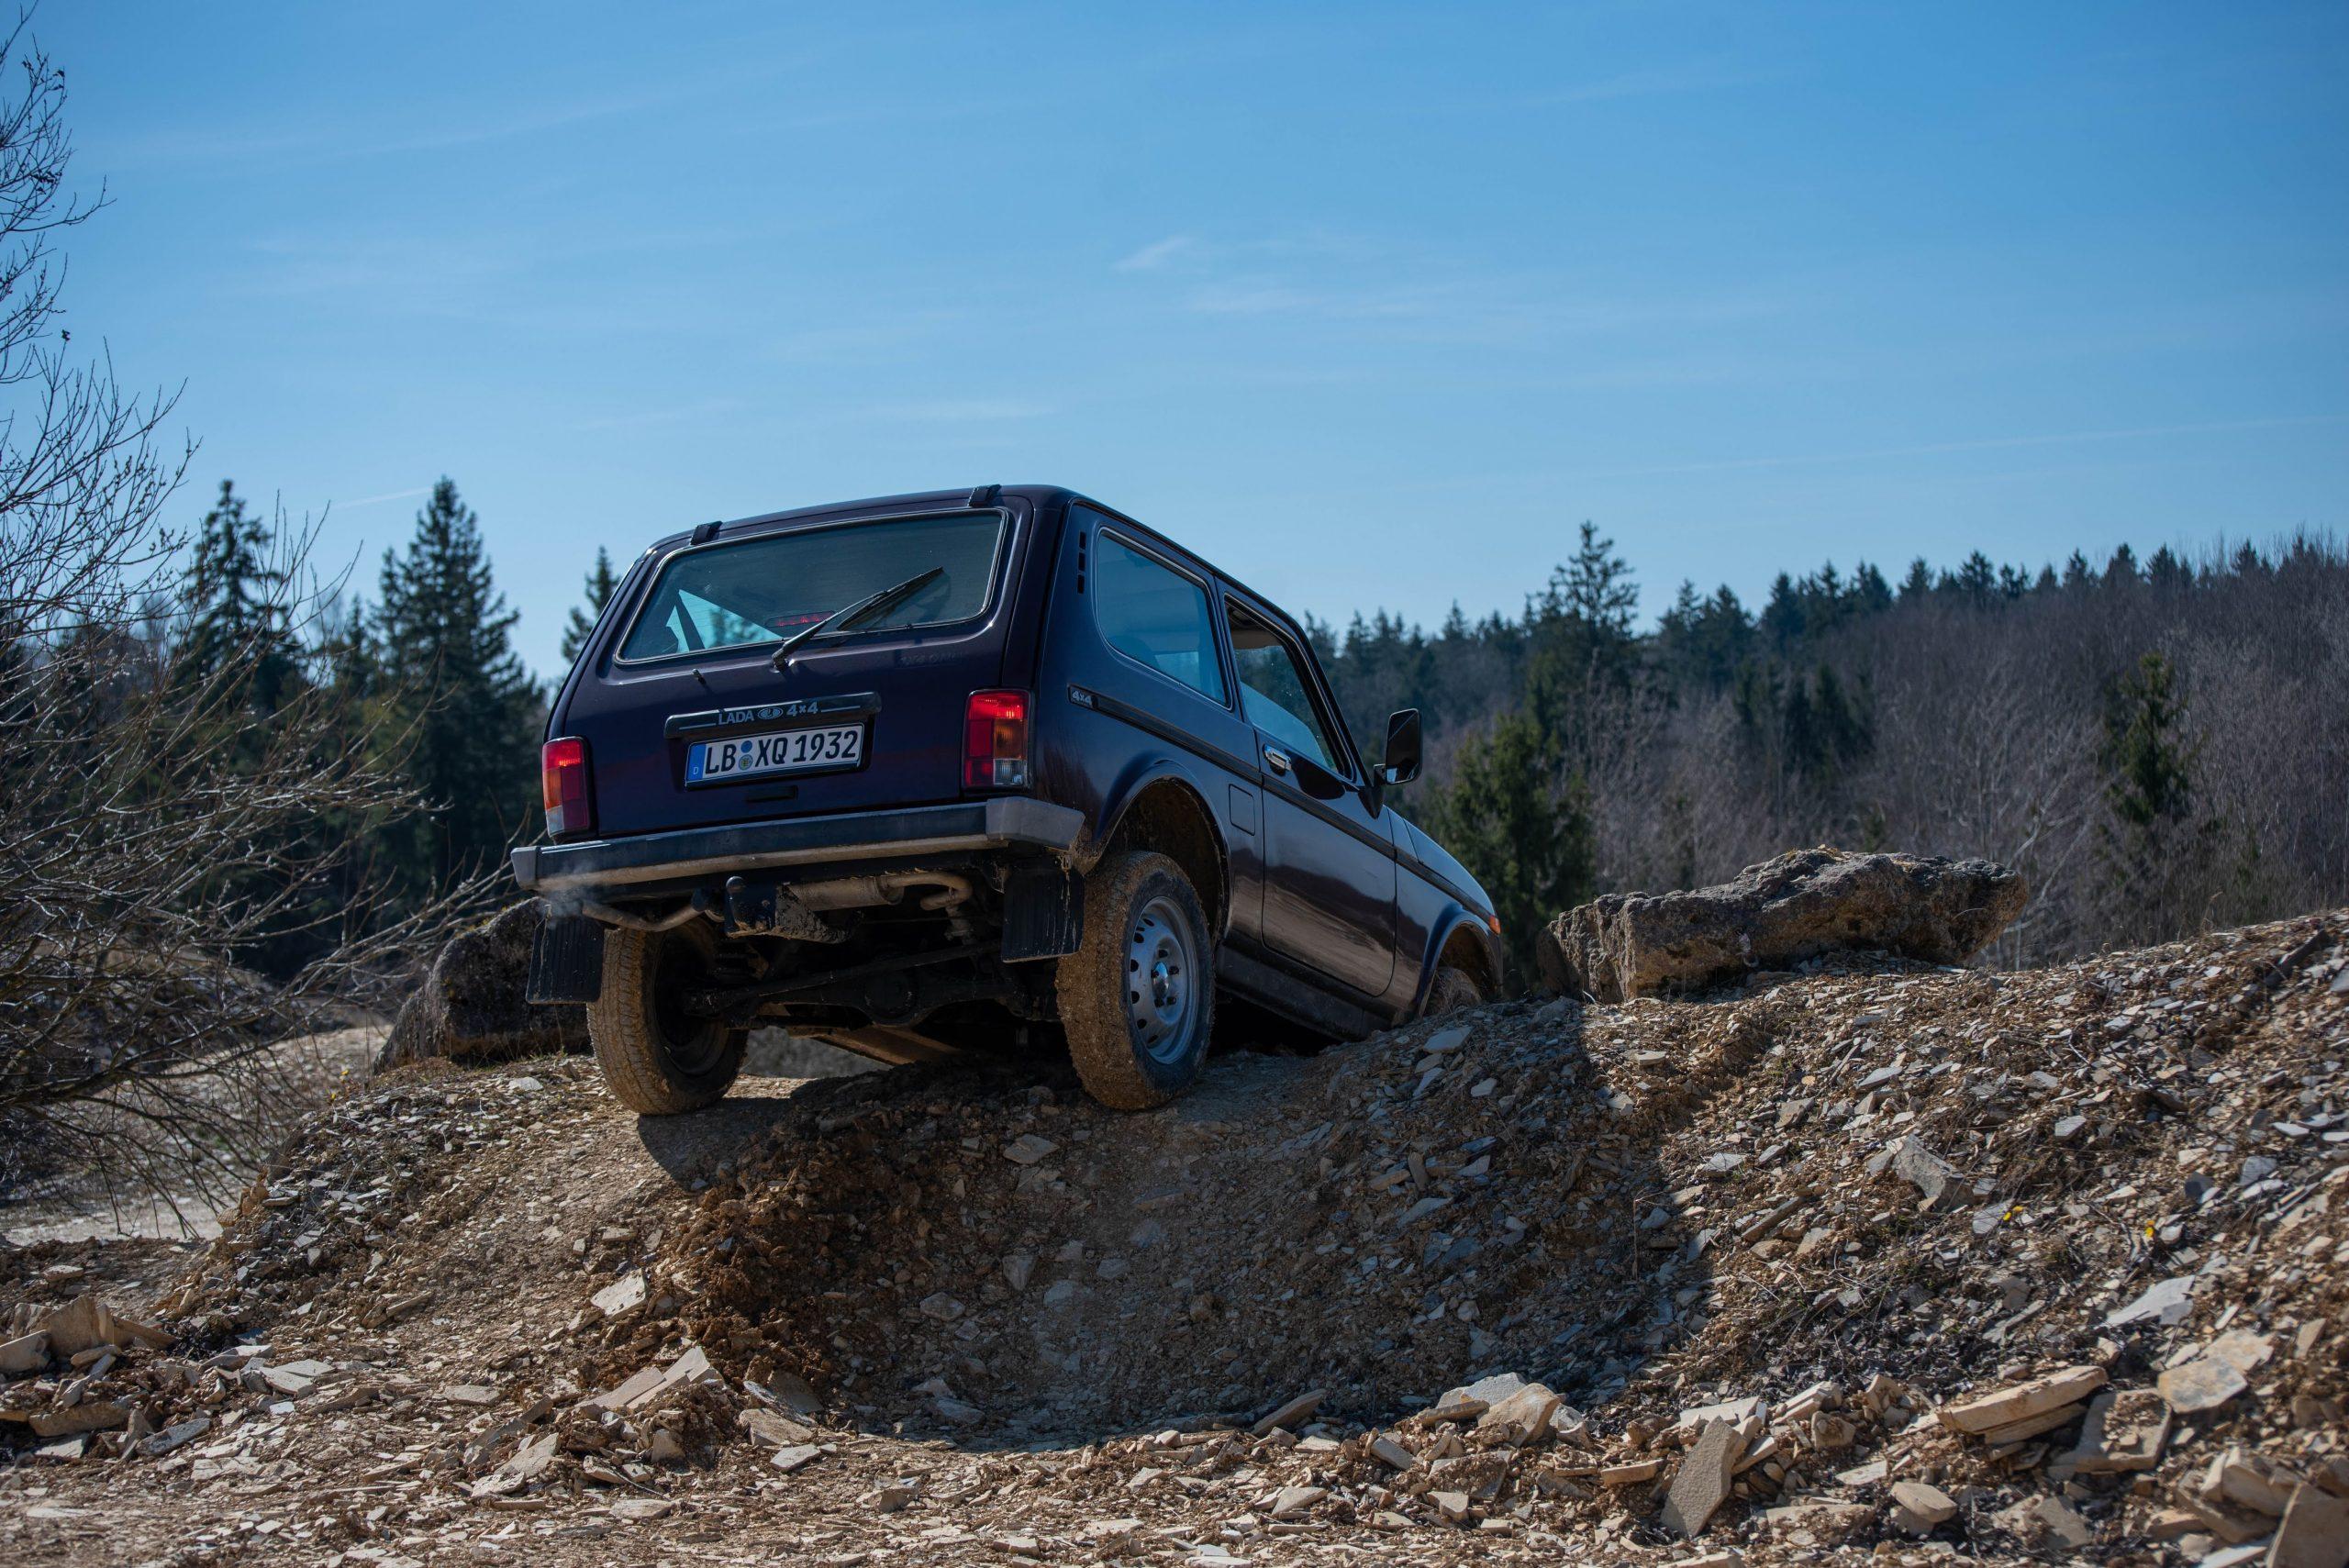 lada niva 4x4 quarry off-road rear